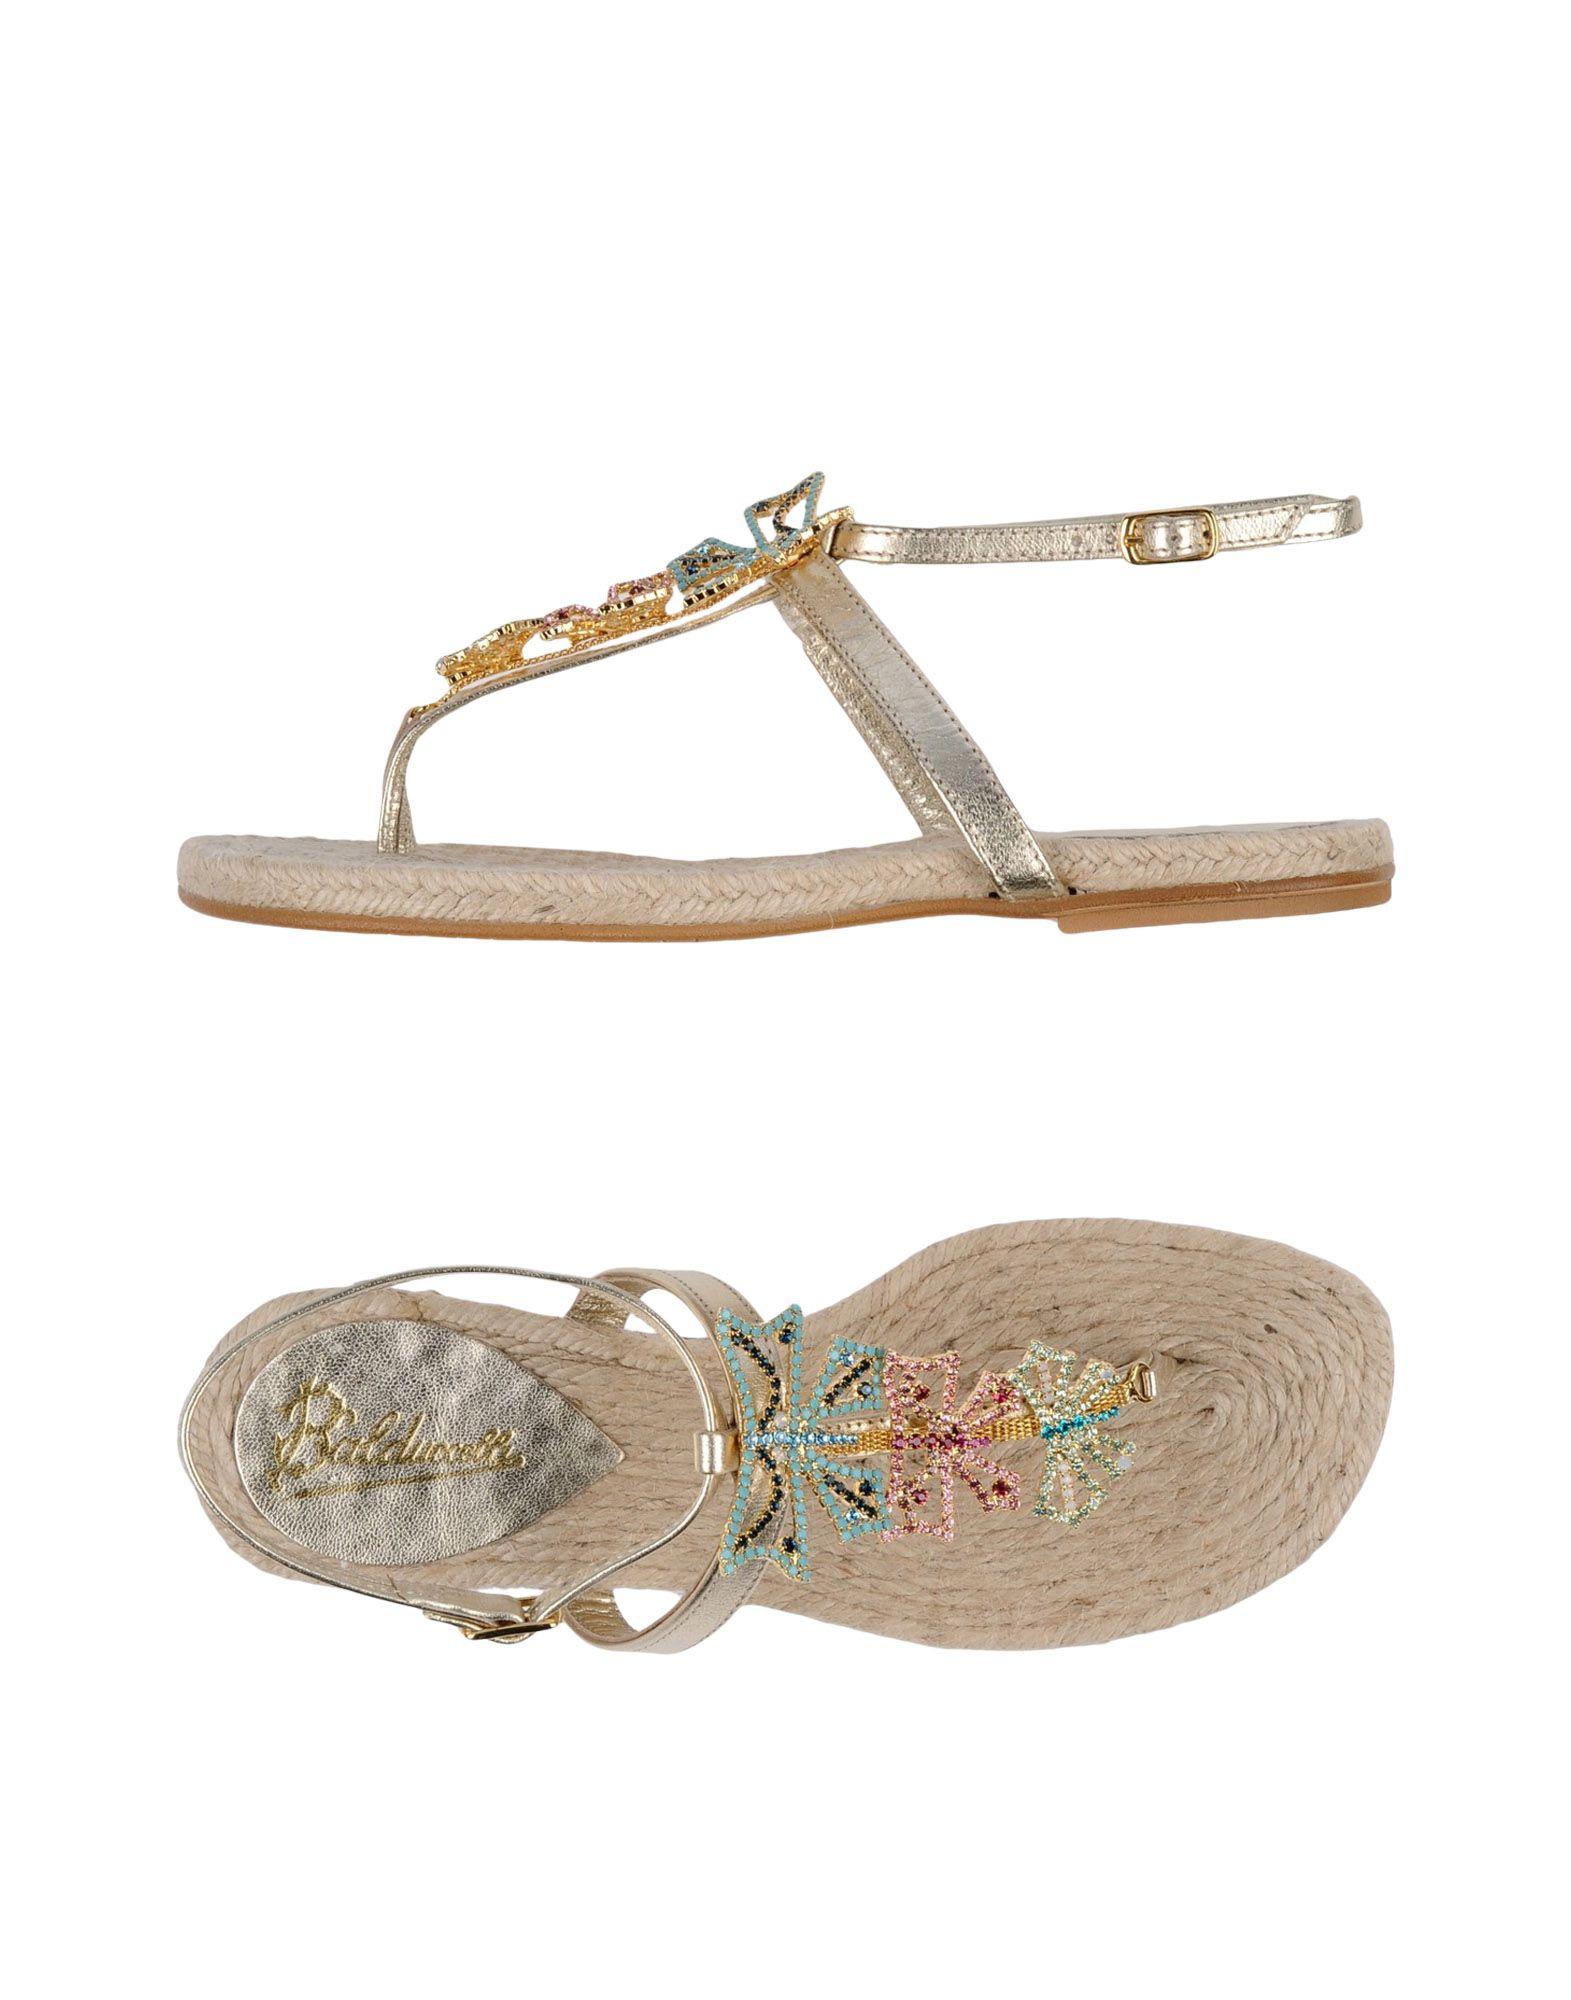 Balduccelli Dianetten Damen  11481577RF Gute Qualität beliebte Schuhe